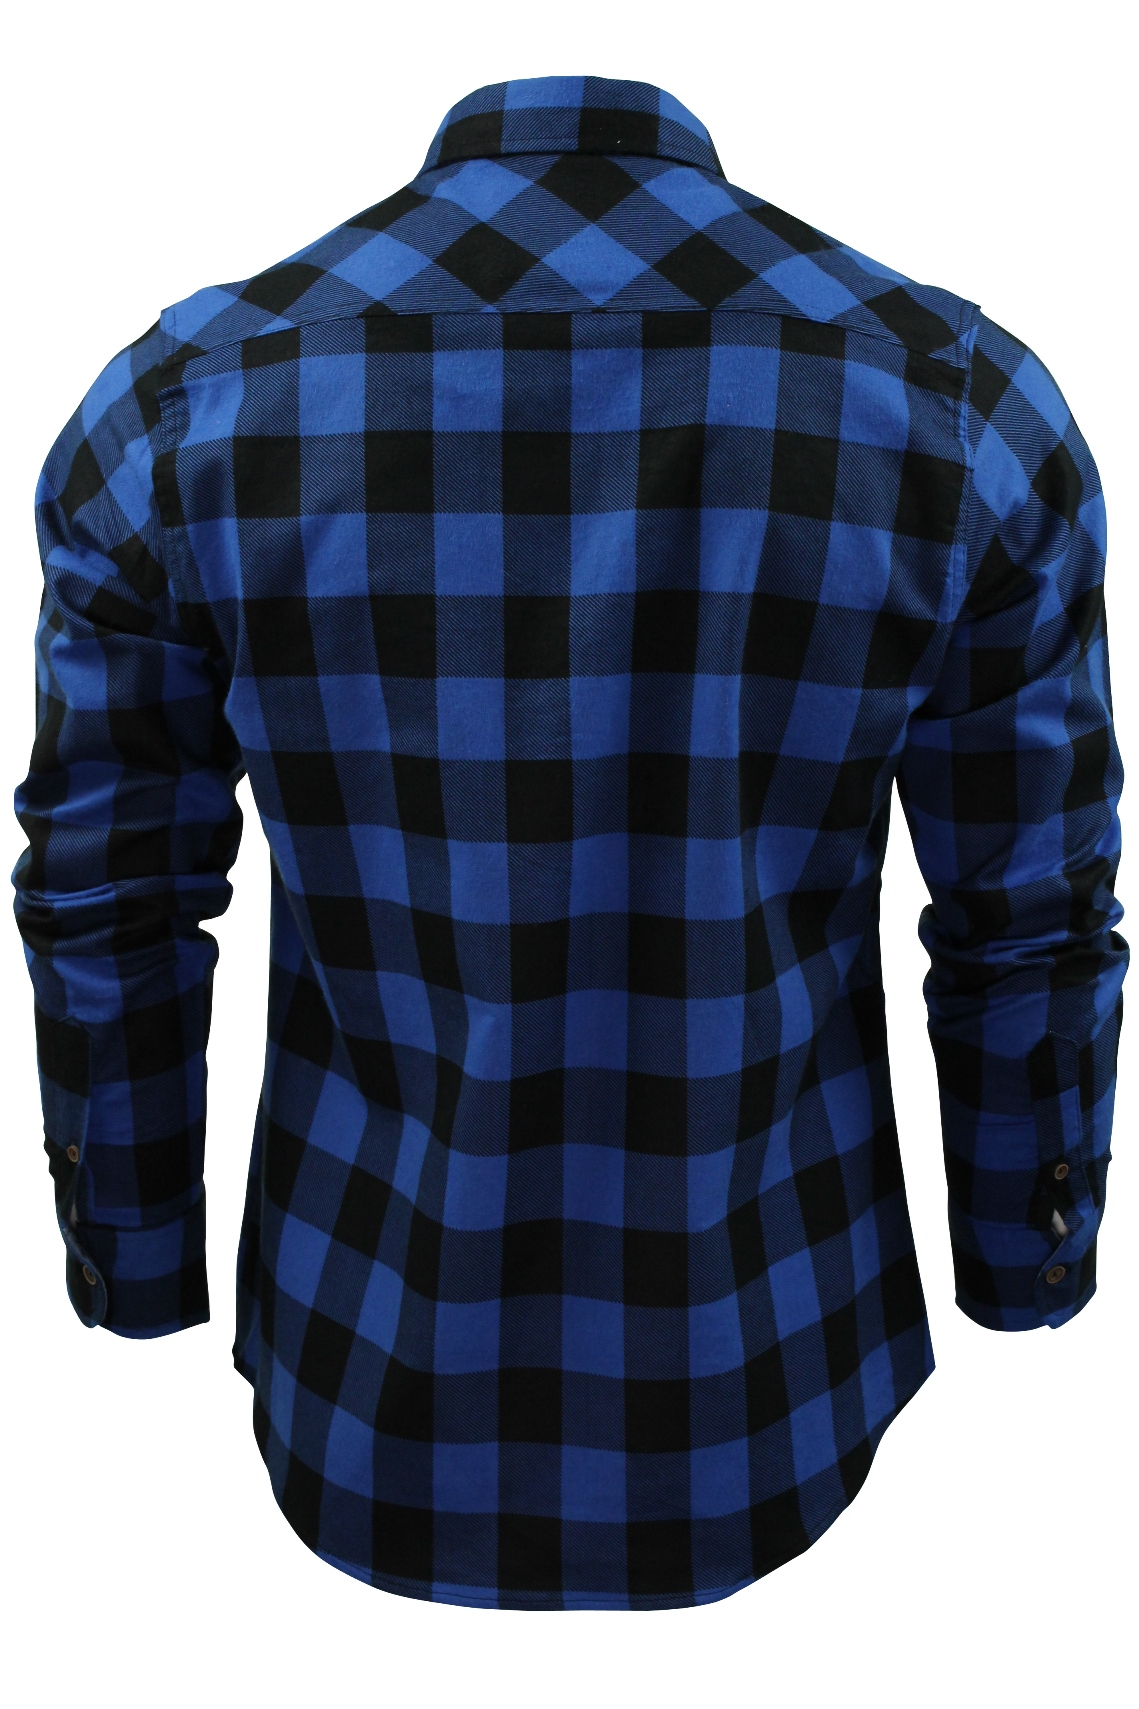 Brave-Soul-Brushed-Flannel-Check-Cotton-Jack-Shirt-Long-Sleeved thumbnail 6